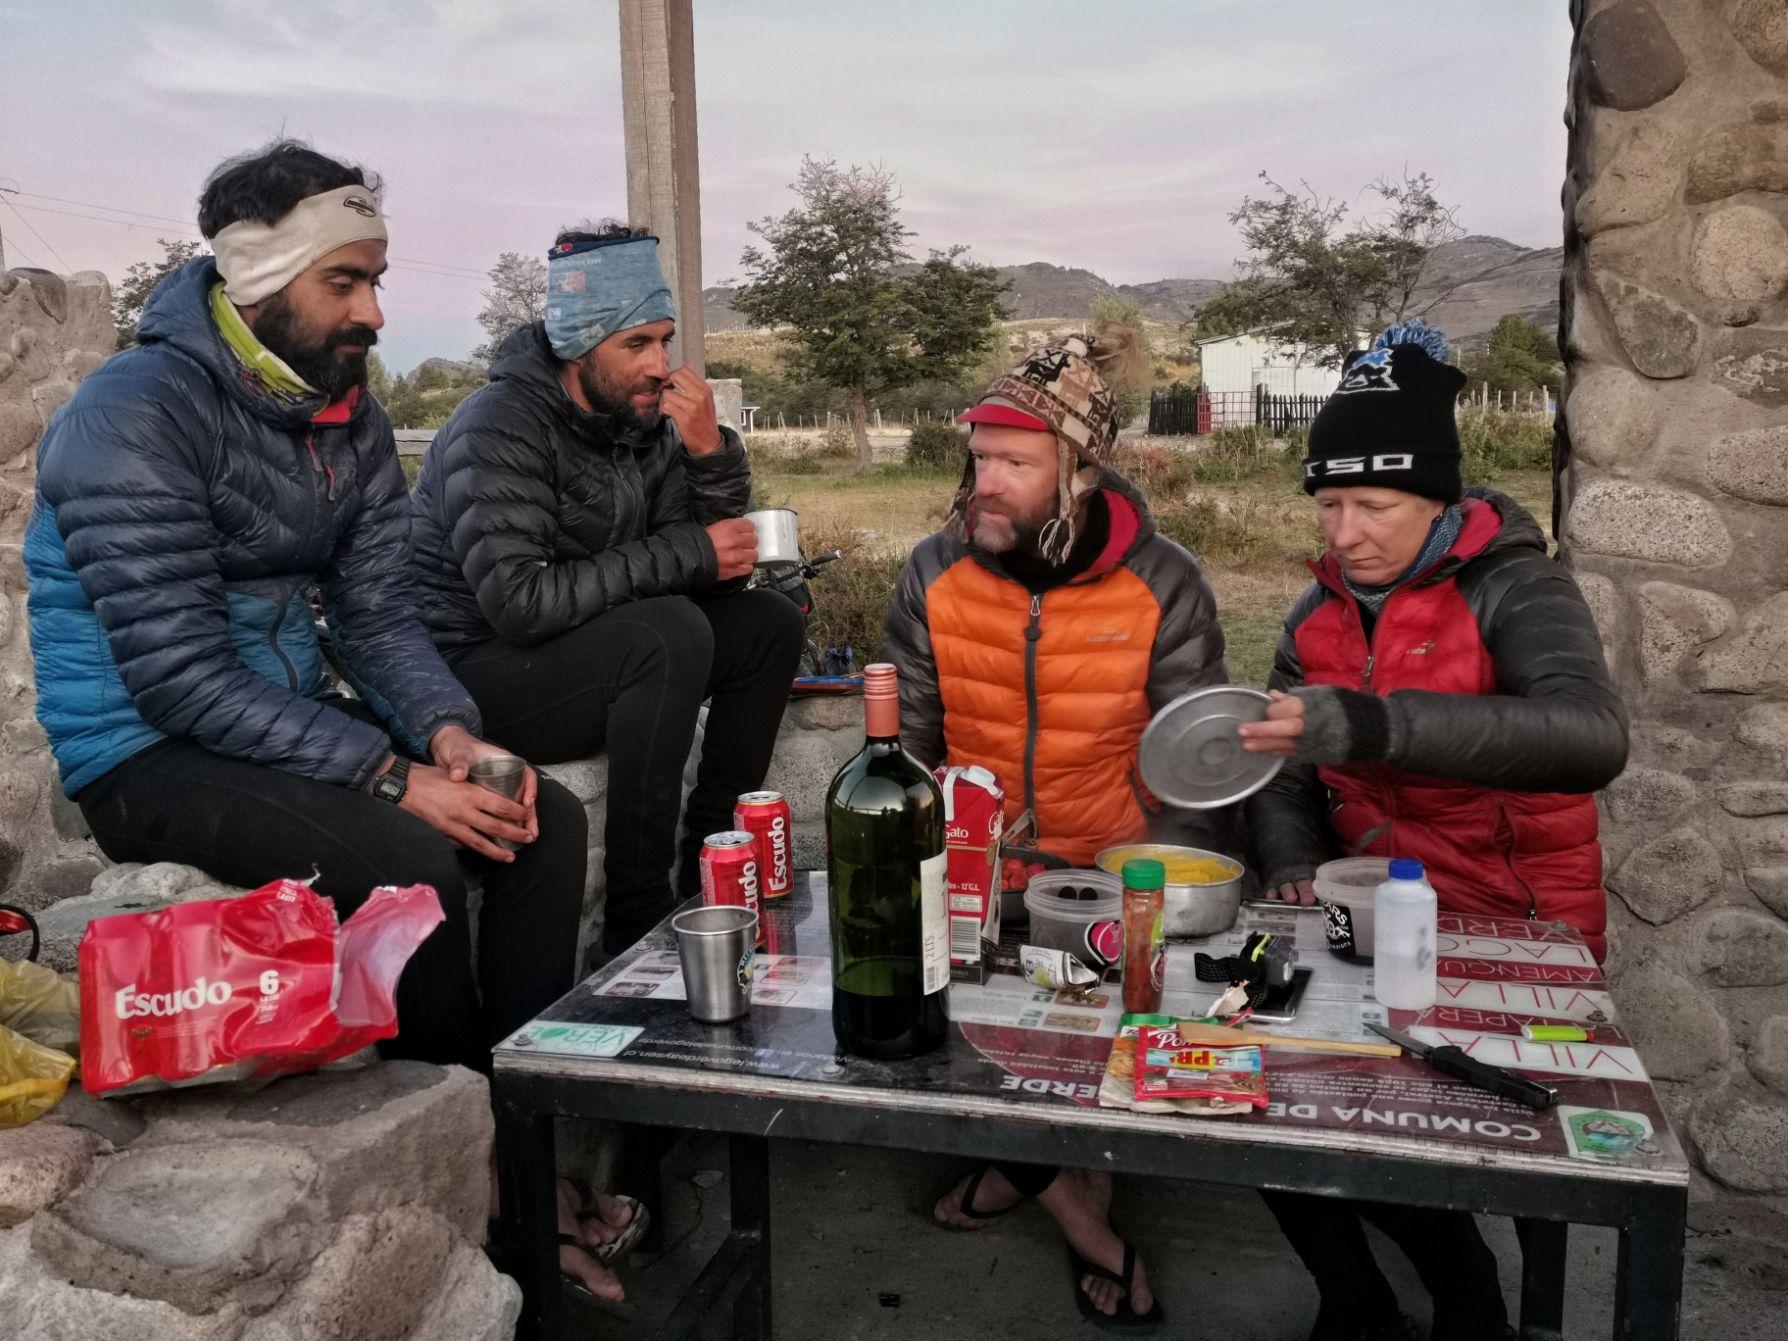 goteras de la patagonia fotos bikepacki